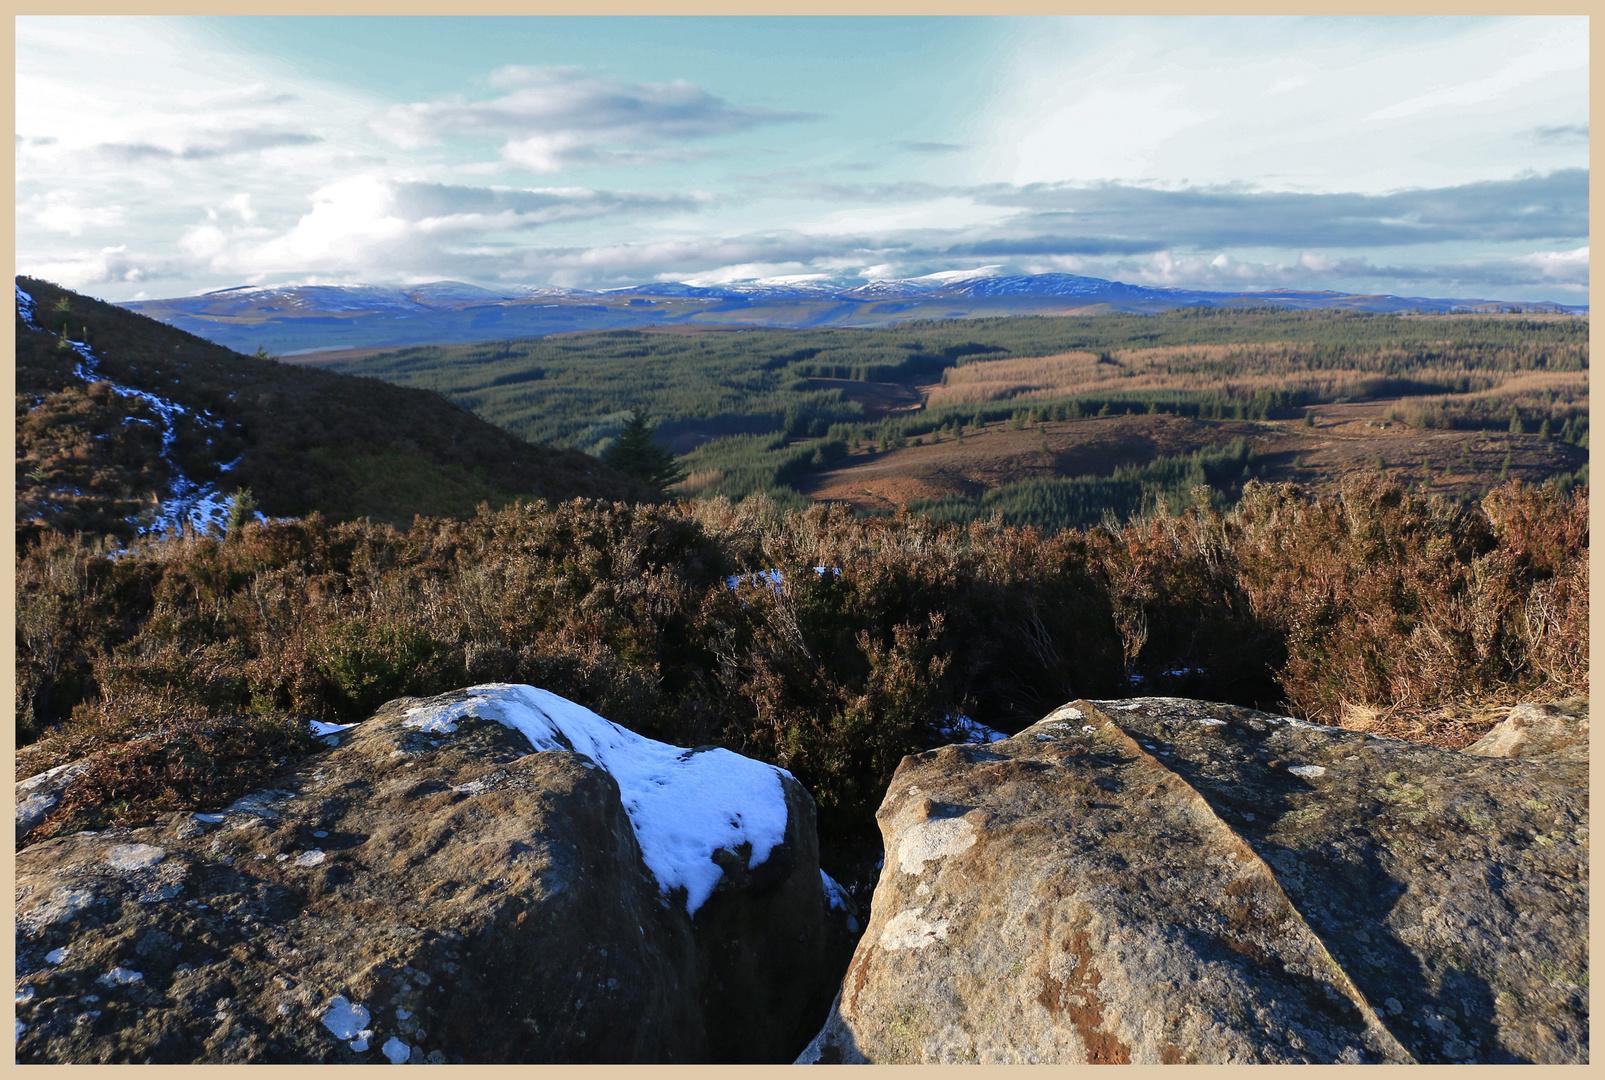 Cheviot Hills from thrunton crags 6